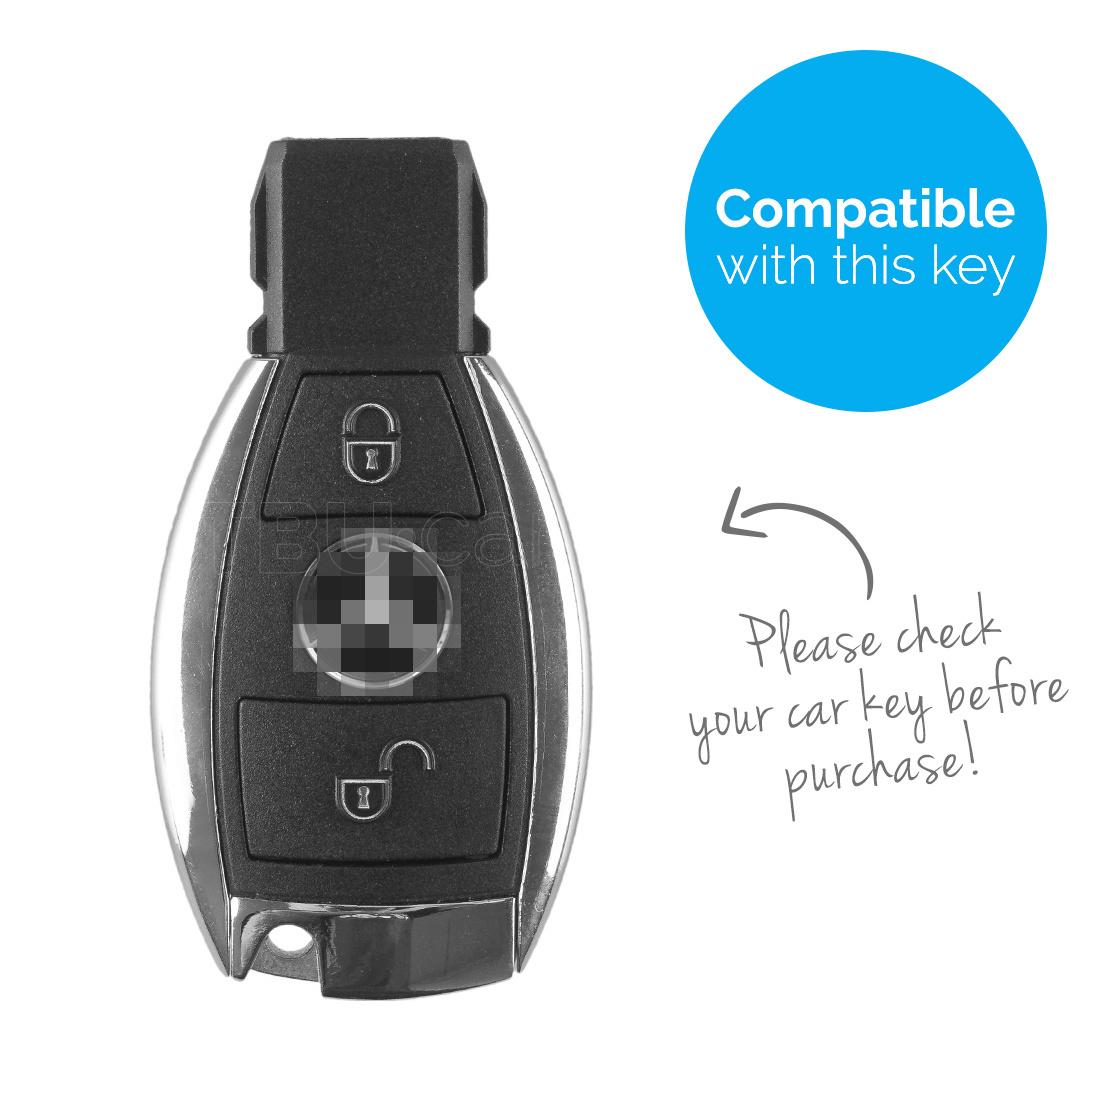 TBU car TBU car Autoschlüssel Hülle kompatibel mit Mercedes 2 Tasten - Schutzhülle aus Silikon - Auto Schlüsselhülle Cover in Schwarz